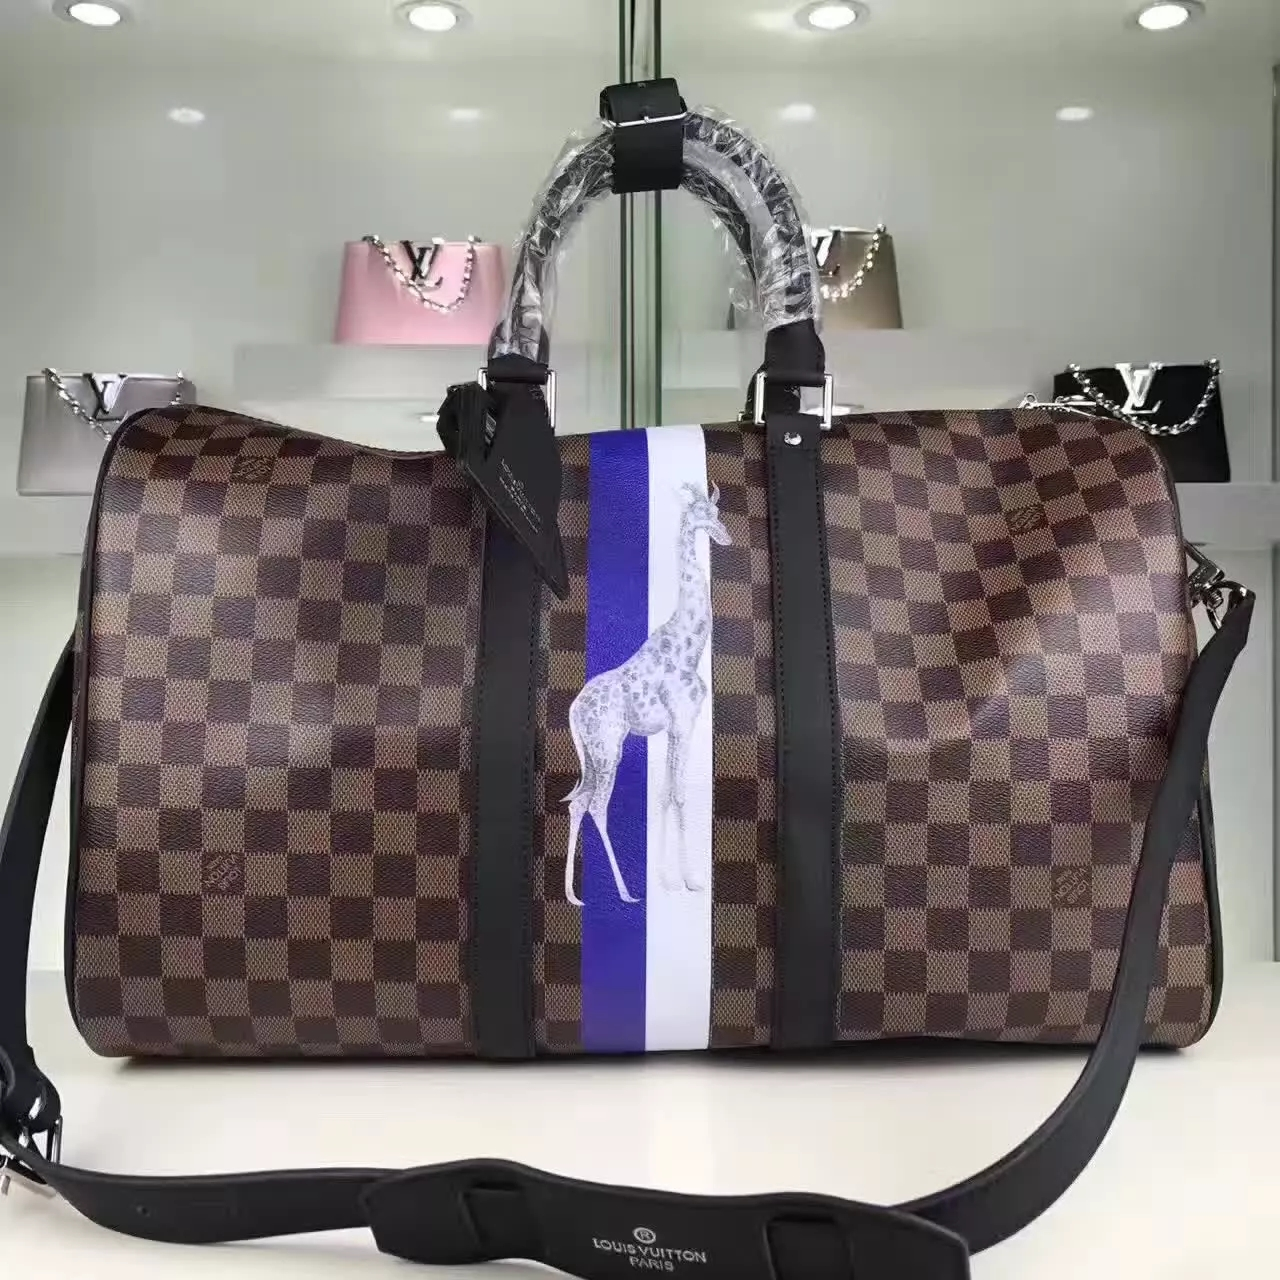 Louis Vuitton N42700 Keepall 45 Bandouliere Damier Ebene Canvas Travel Bag